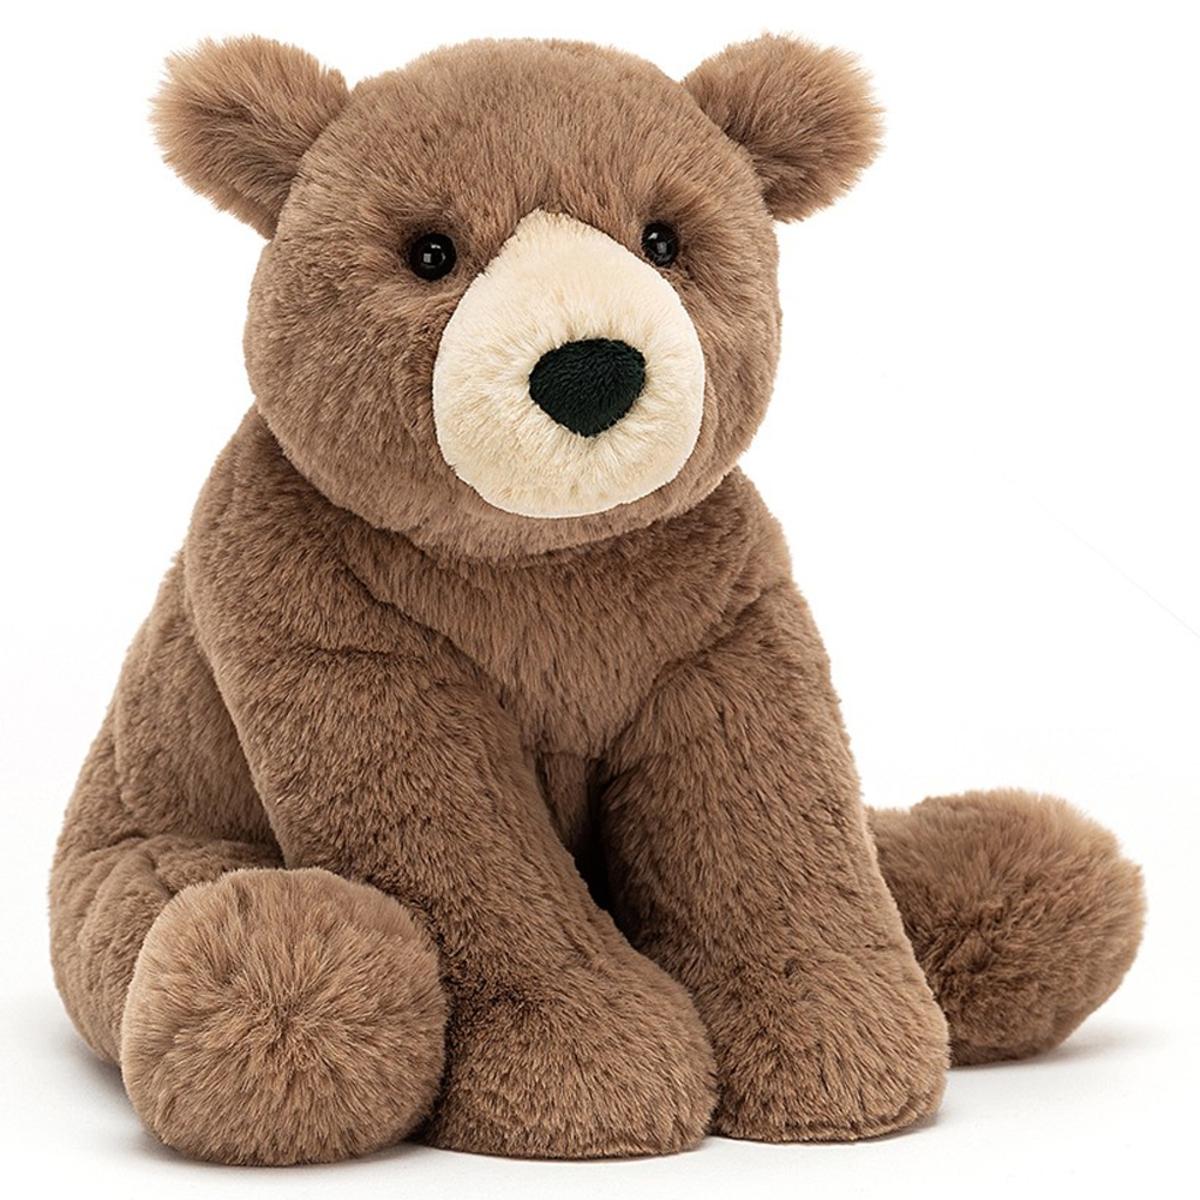 Peluche Woody Bear - Medium Peluche Ours 27 cm